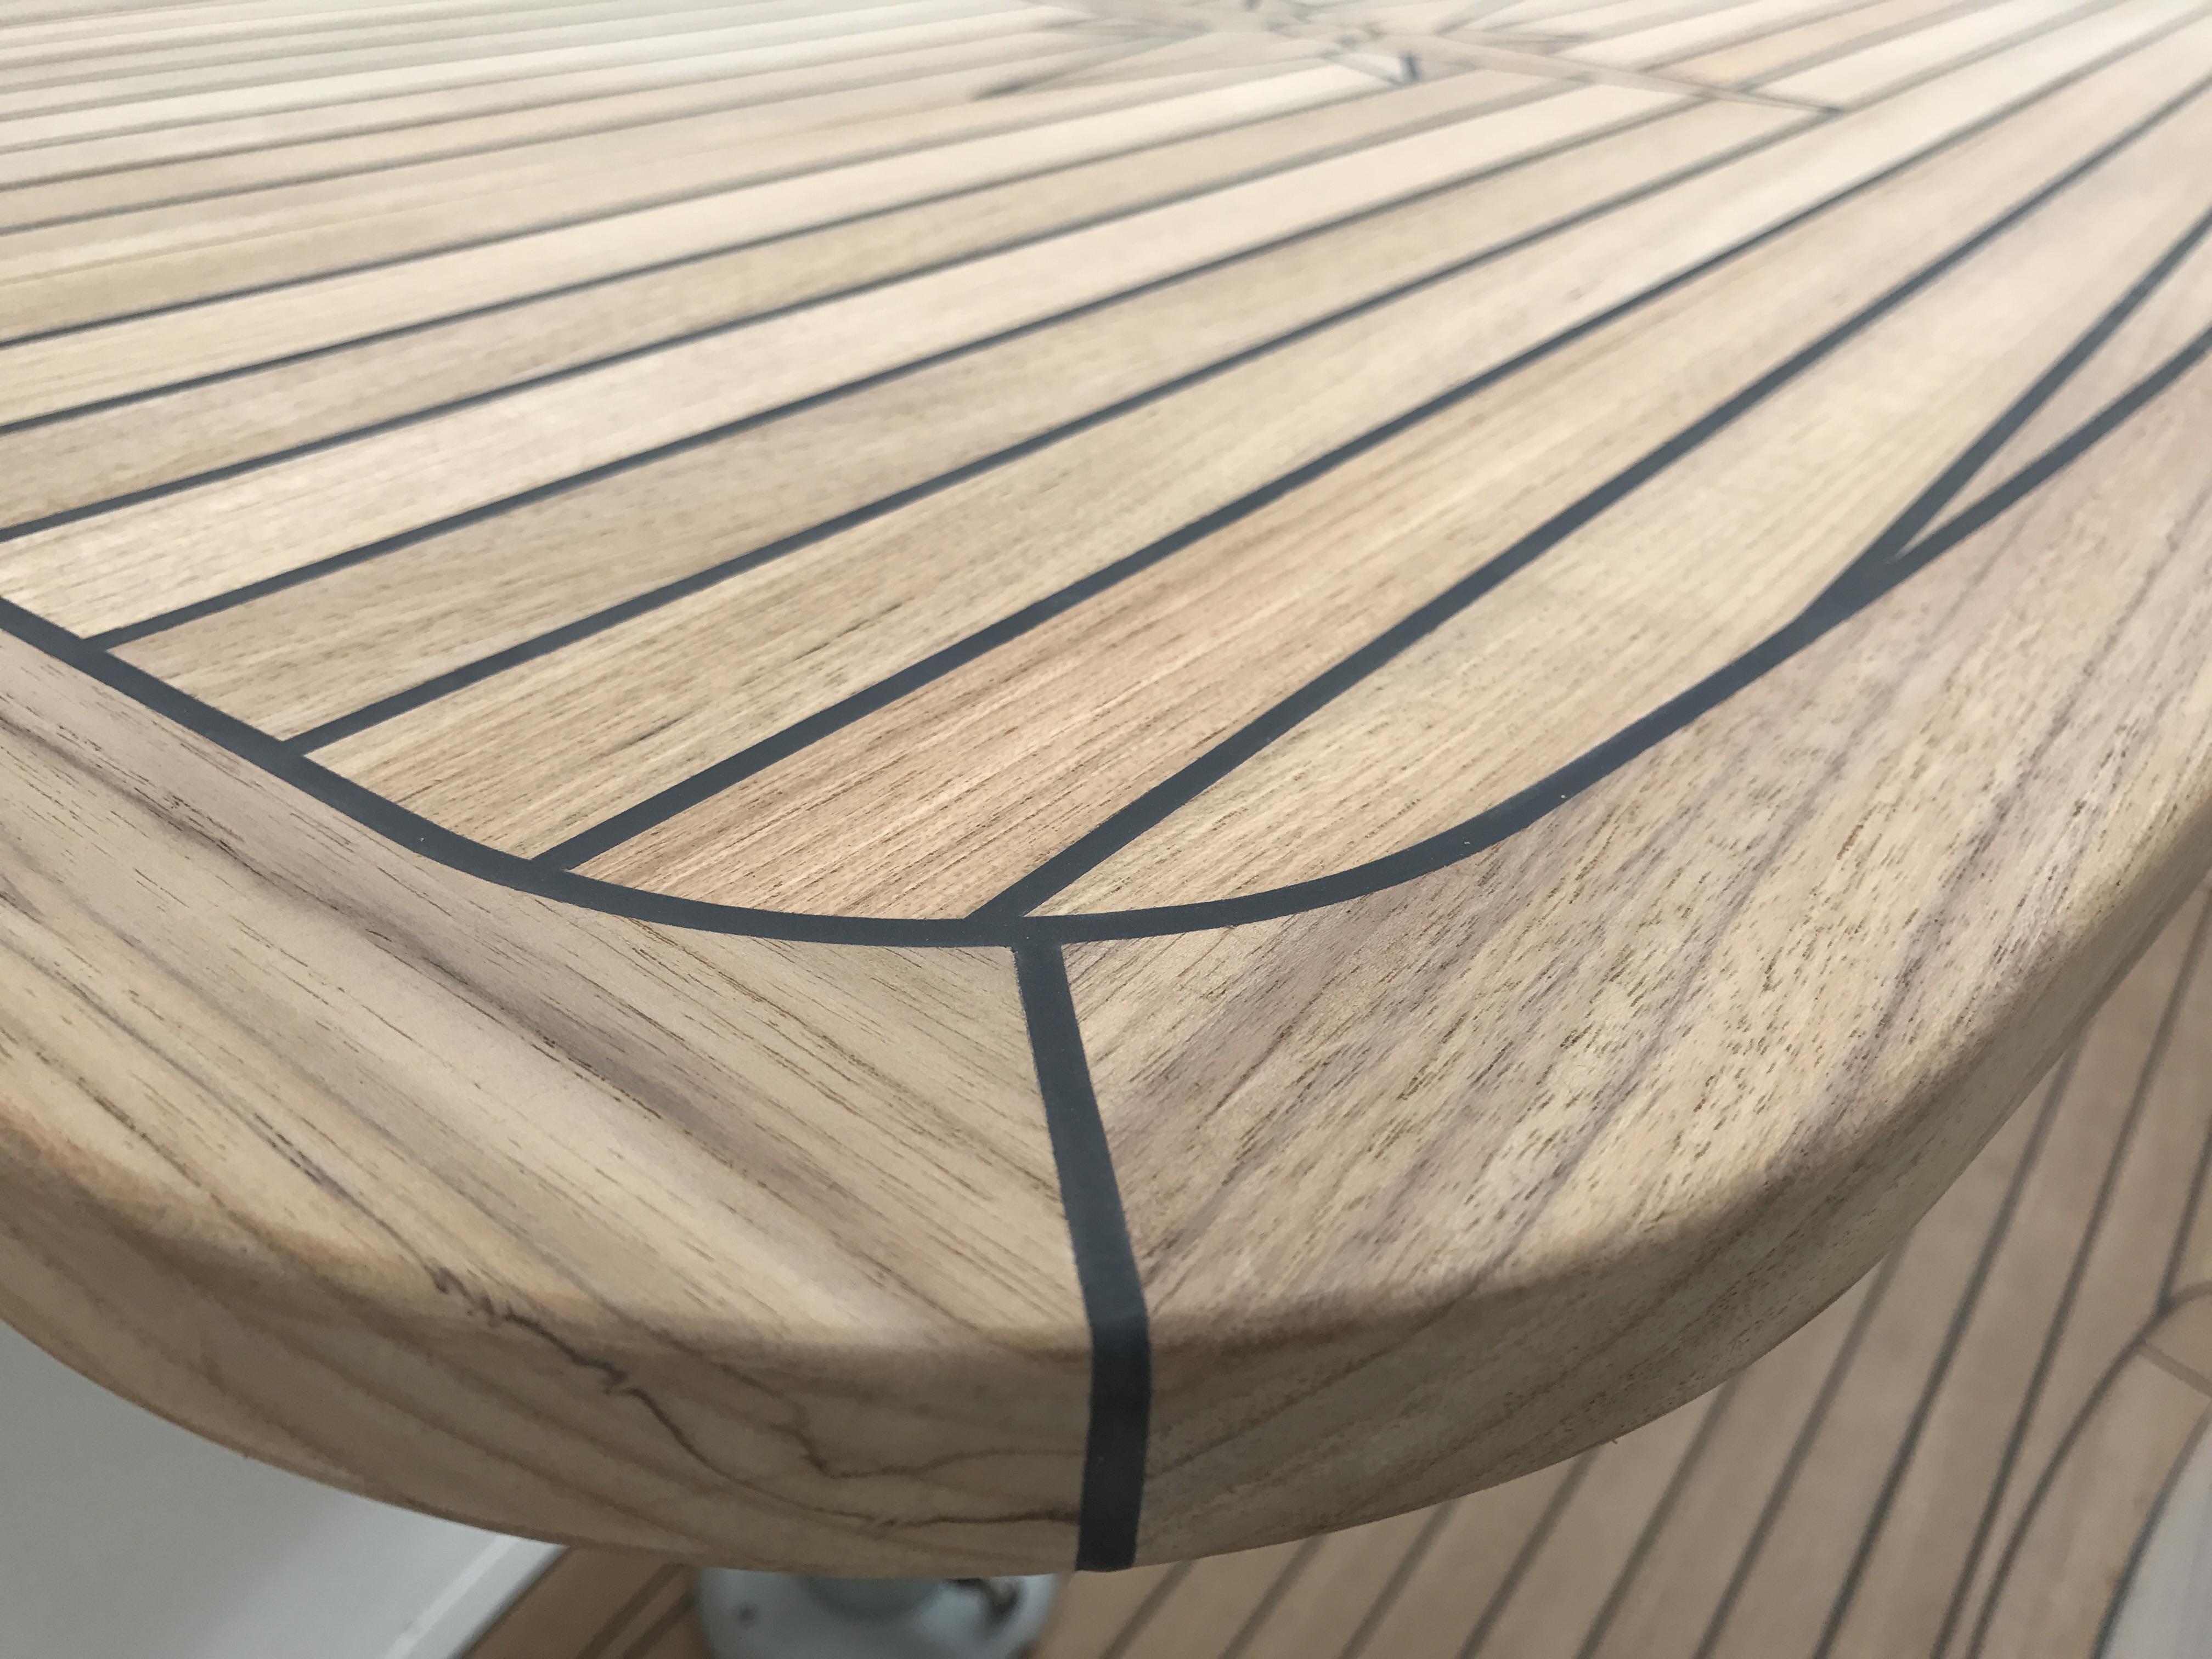 Sealine S41 S42 S43 Teak Boat Table Marine Teak